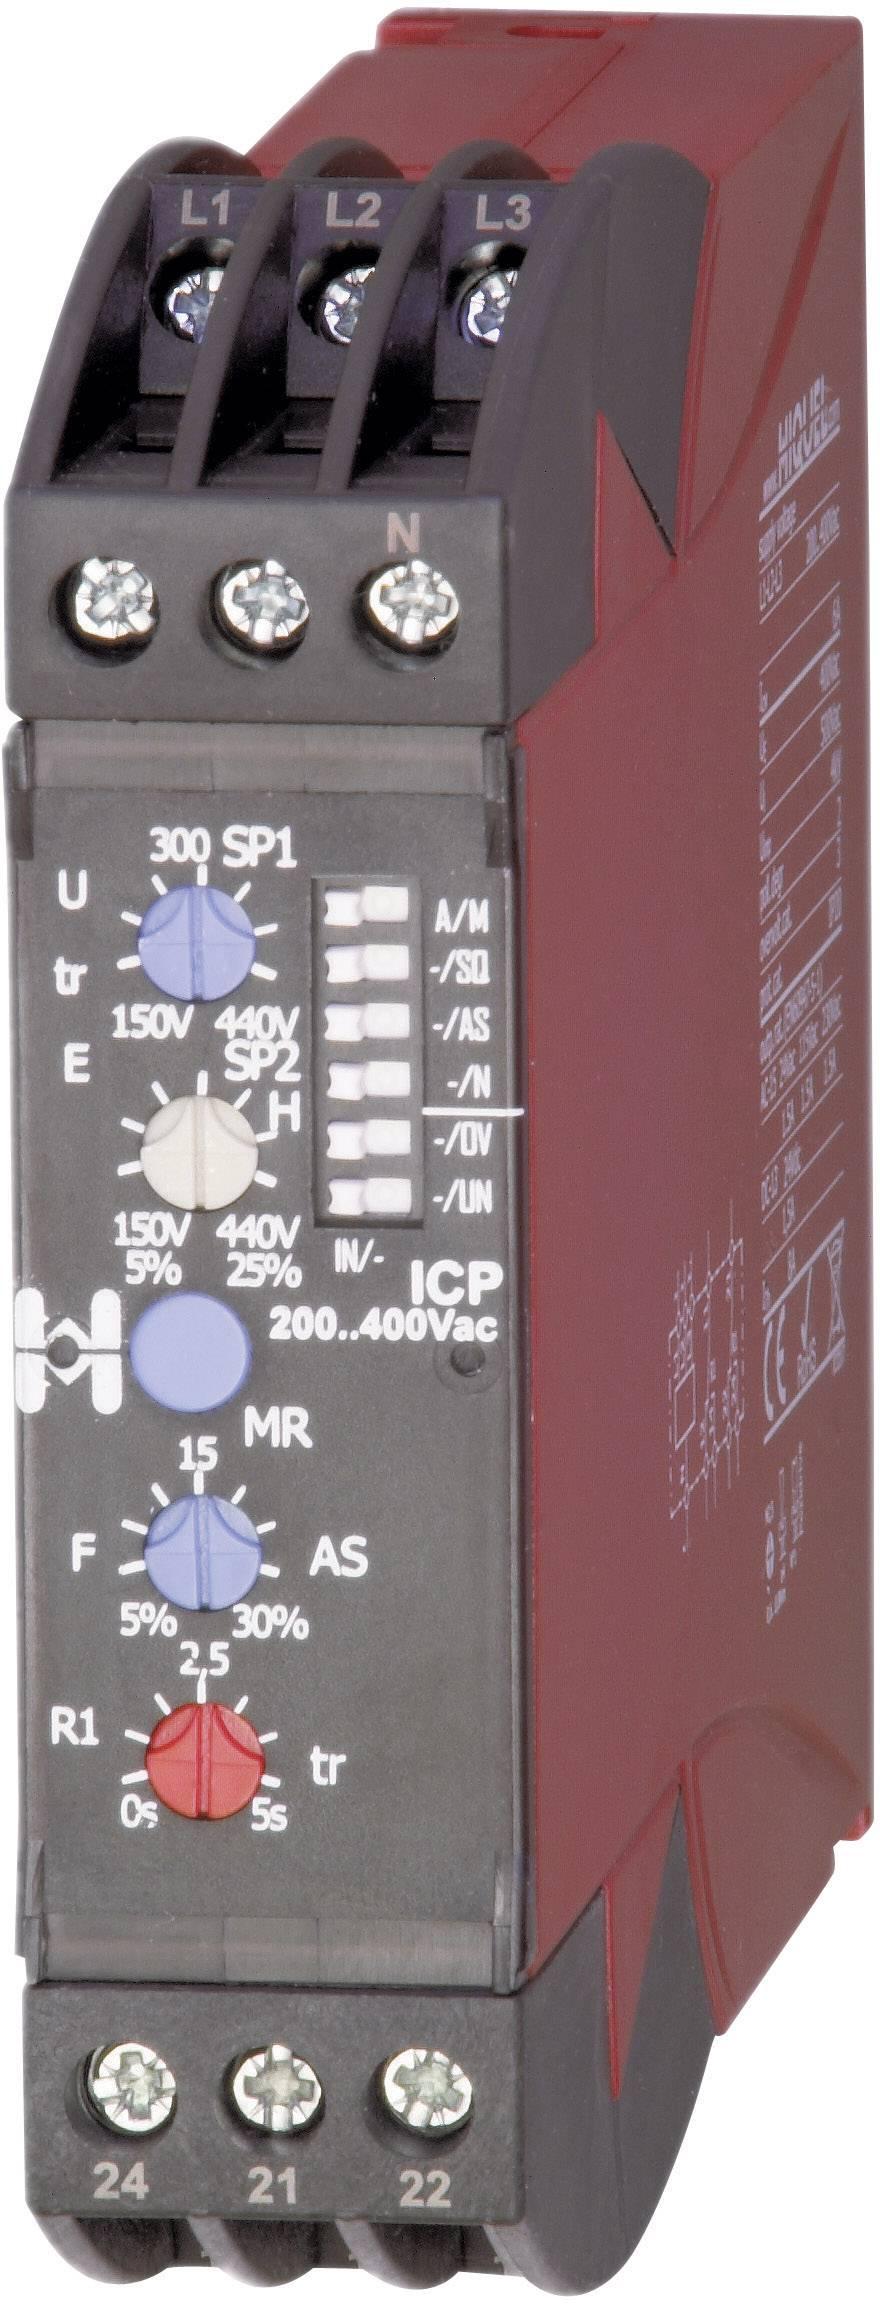 Kontrolné relé Hiquel ICP 300...500Vac ICP 300...500Vac